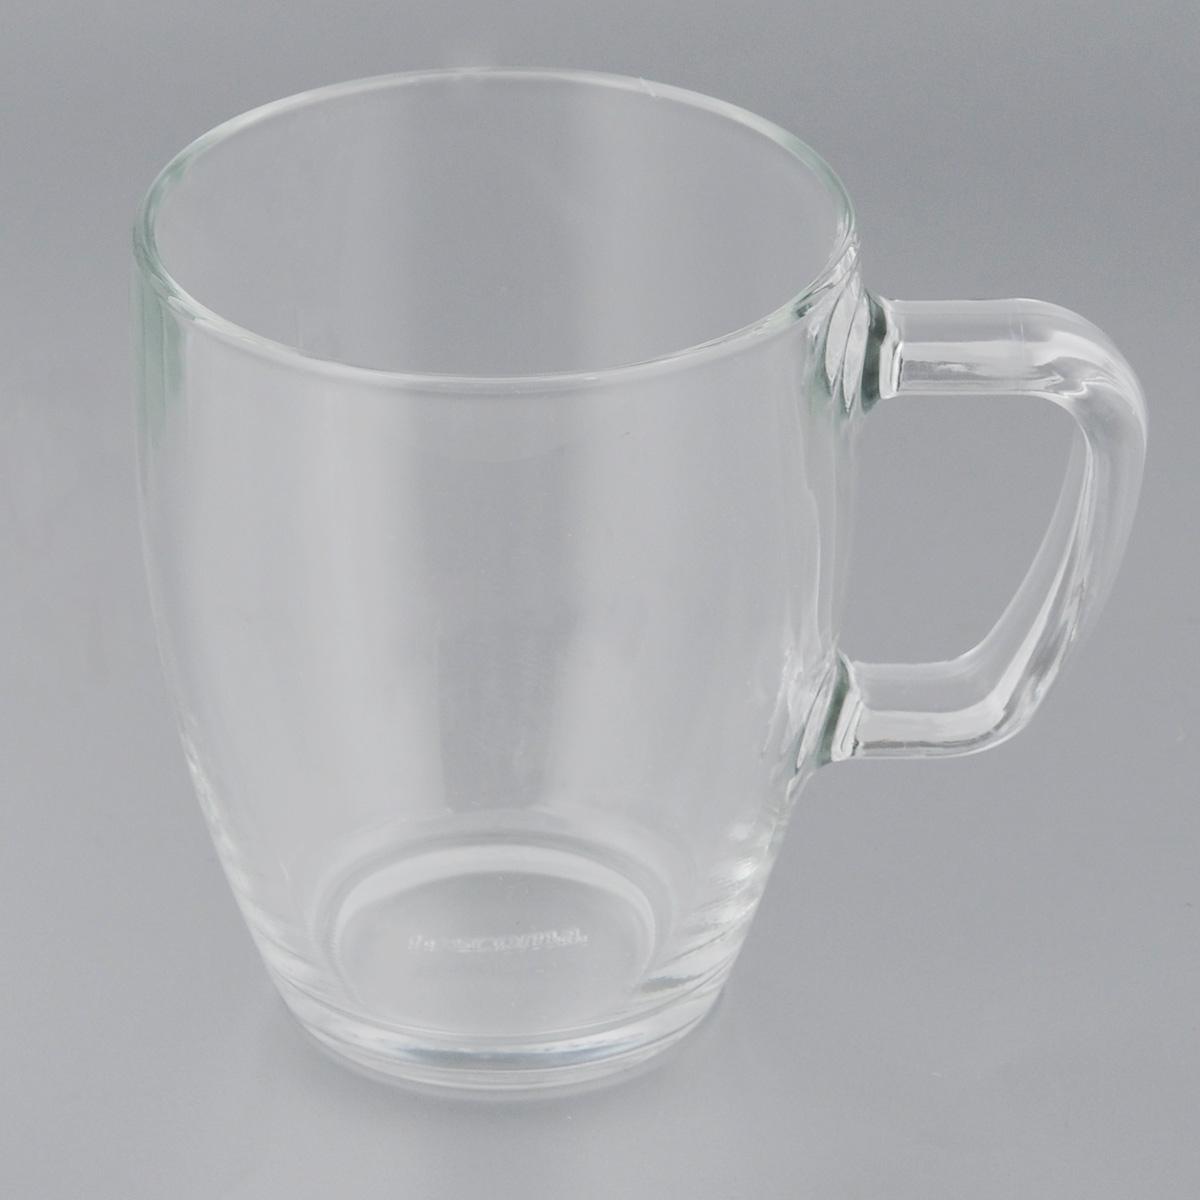 Кружка Tescoma Crema, 400 мл кружка tescoma crema латте маккиато 300мл стекло